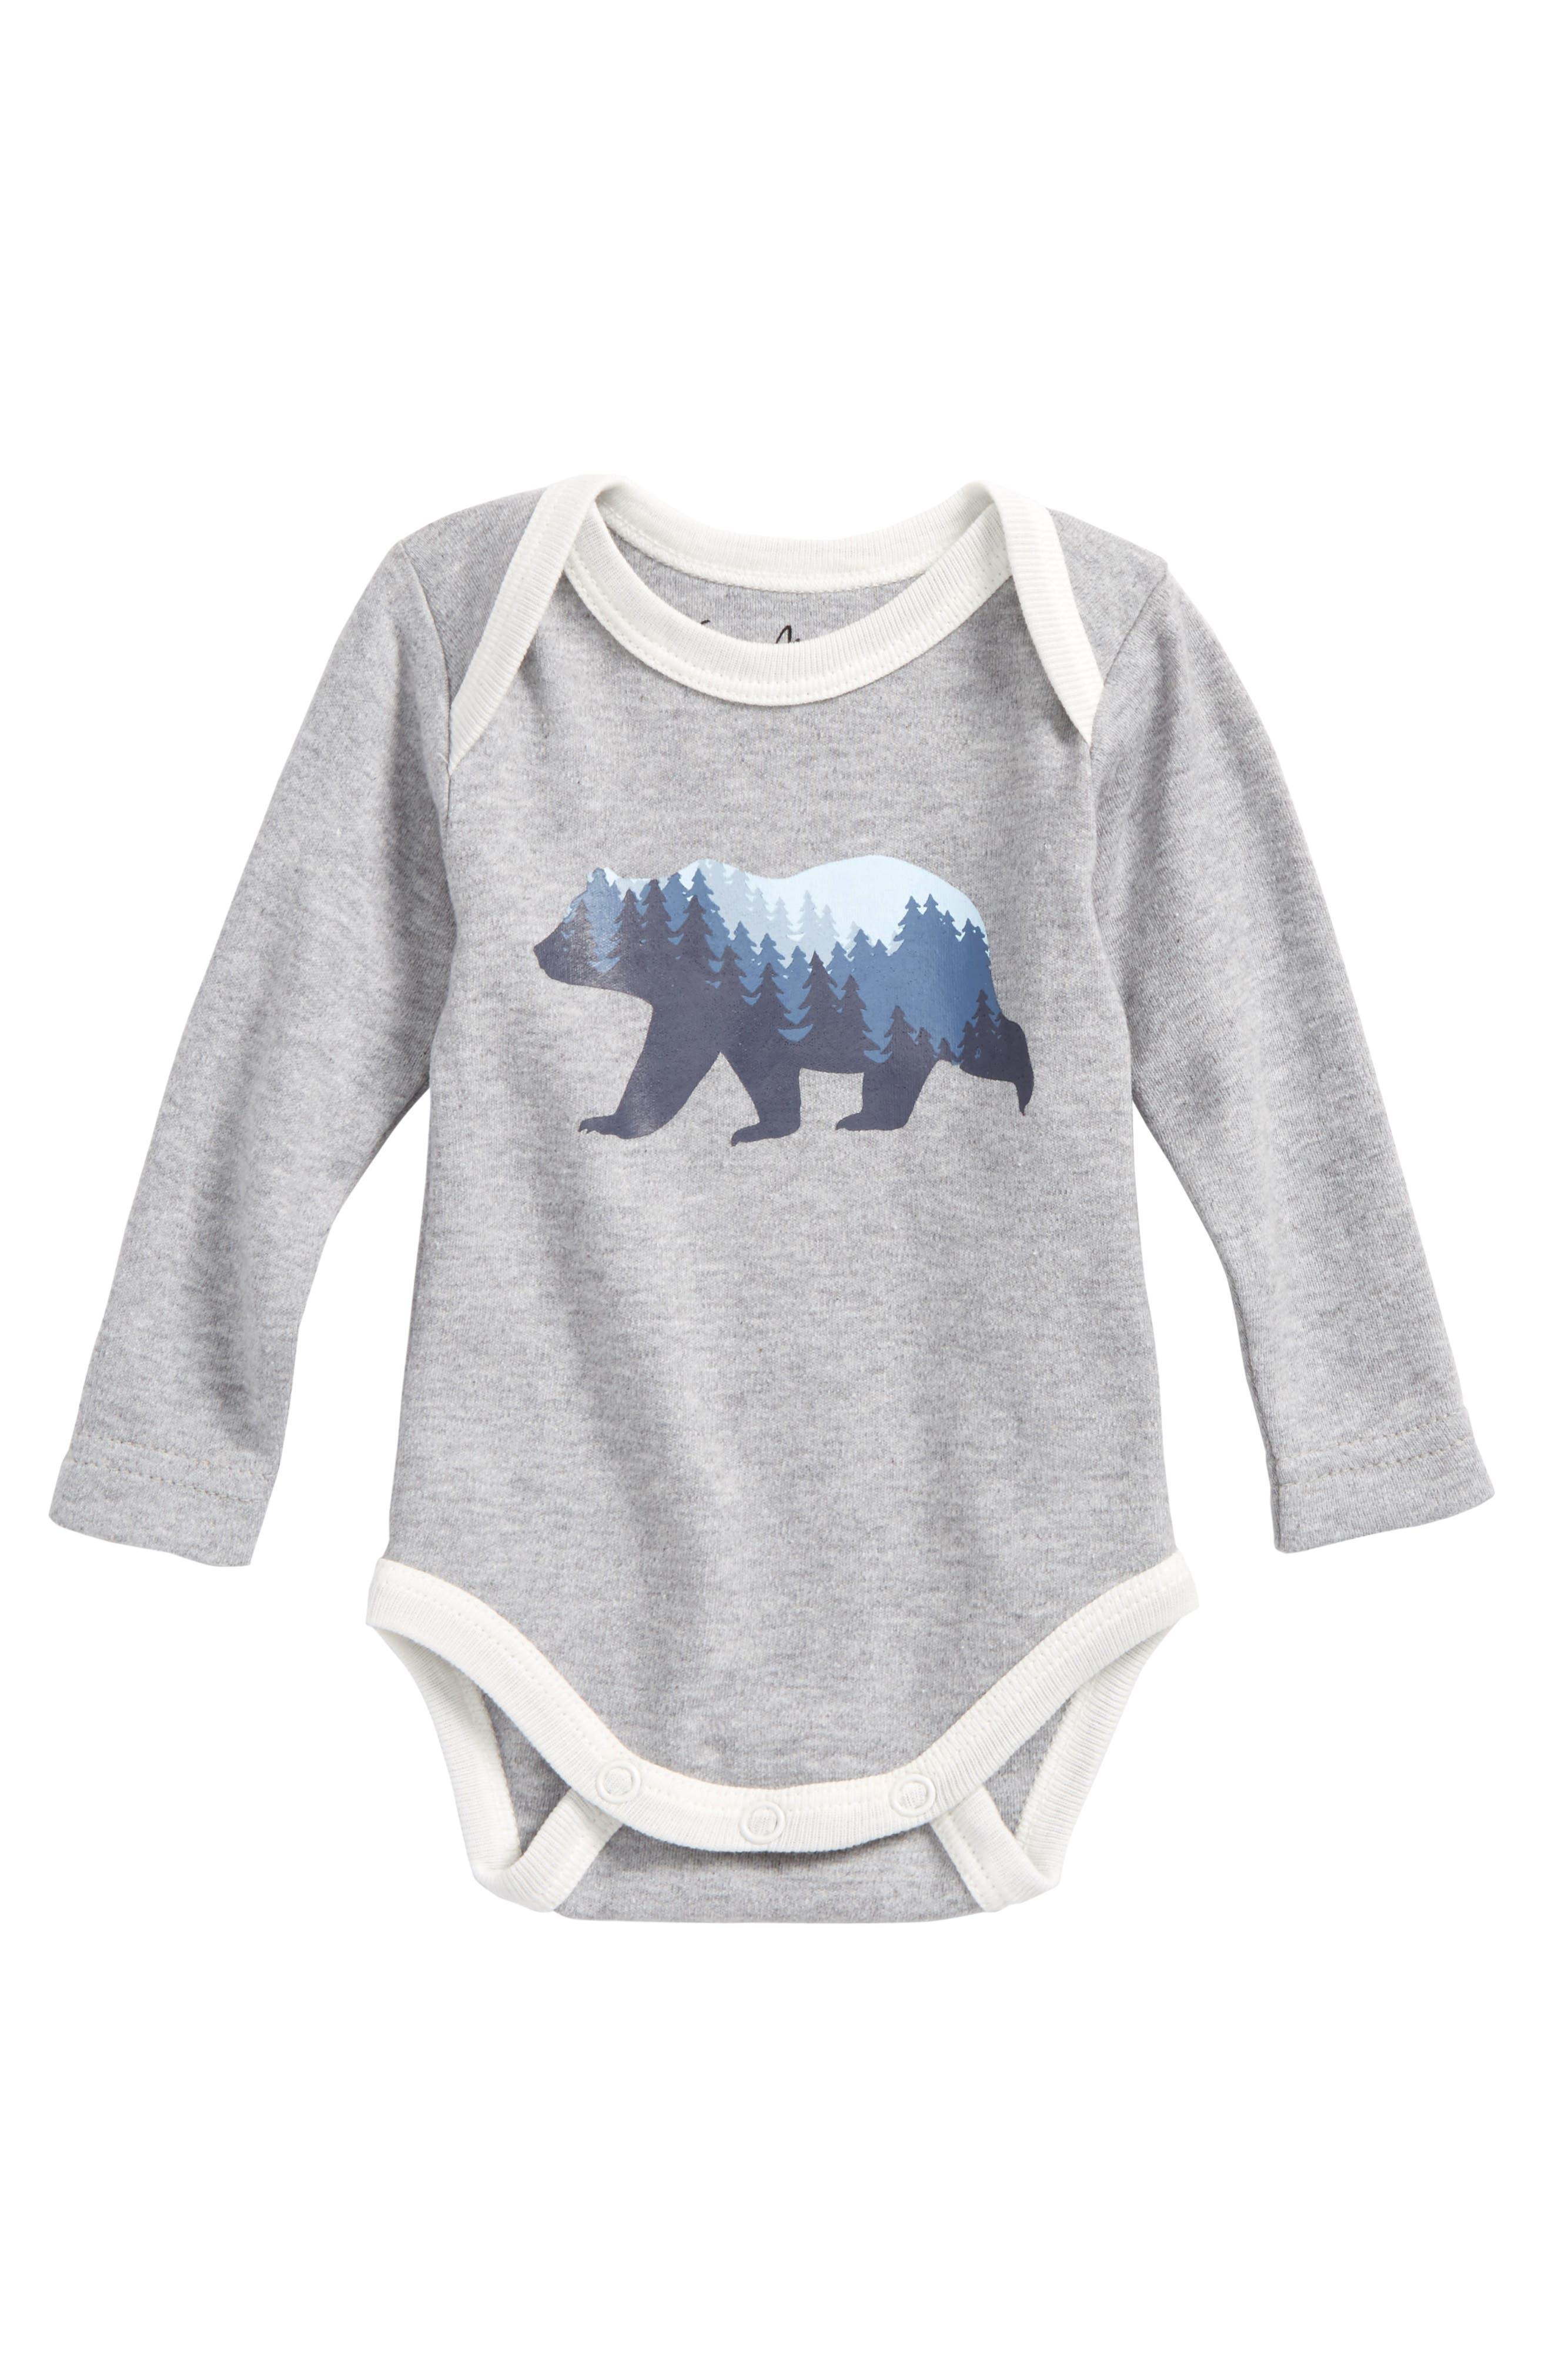 Bear Graphic Organic Cotton Bodysuit,                             Main thumbnail 1, color,                             020